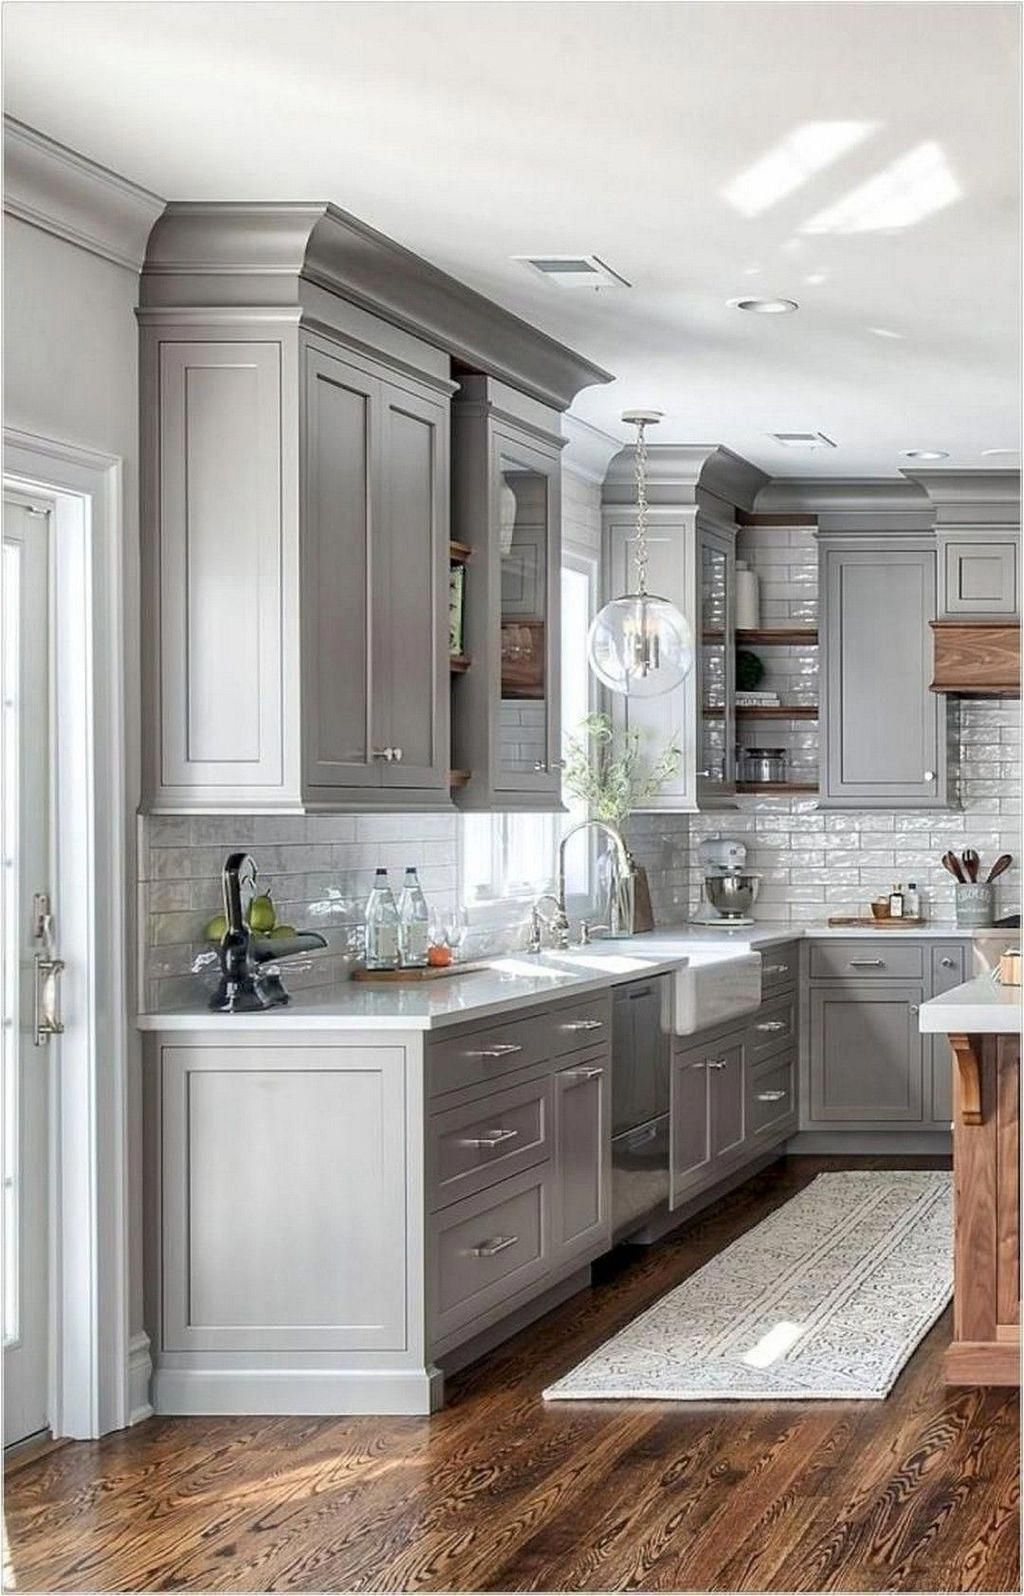 Check Out Here Kitchen Paint Ideas In 2020 Modern Kitchen Cabinet Design Farmhouse Kitchen Backsplash Farmhouse Kitchen Design